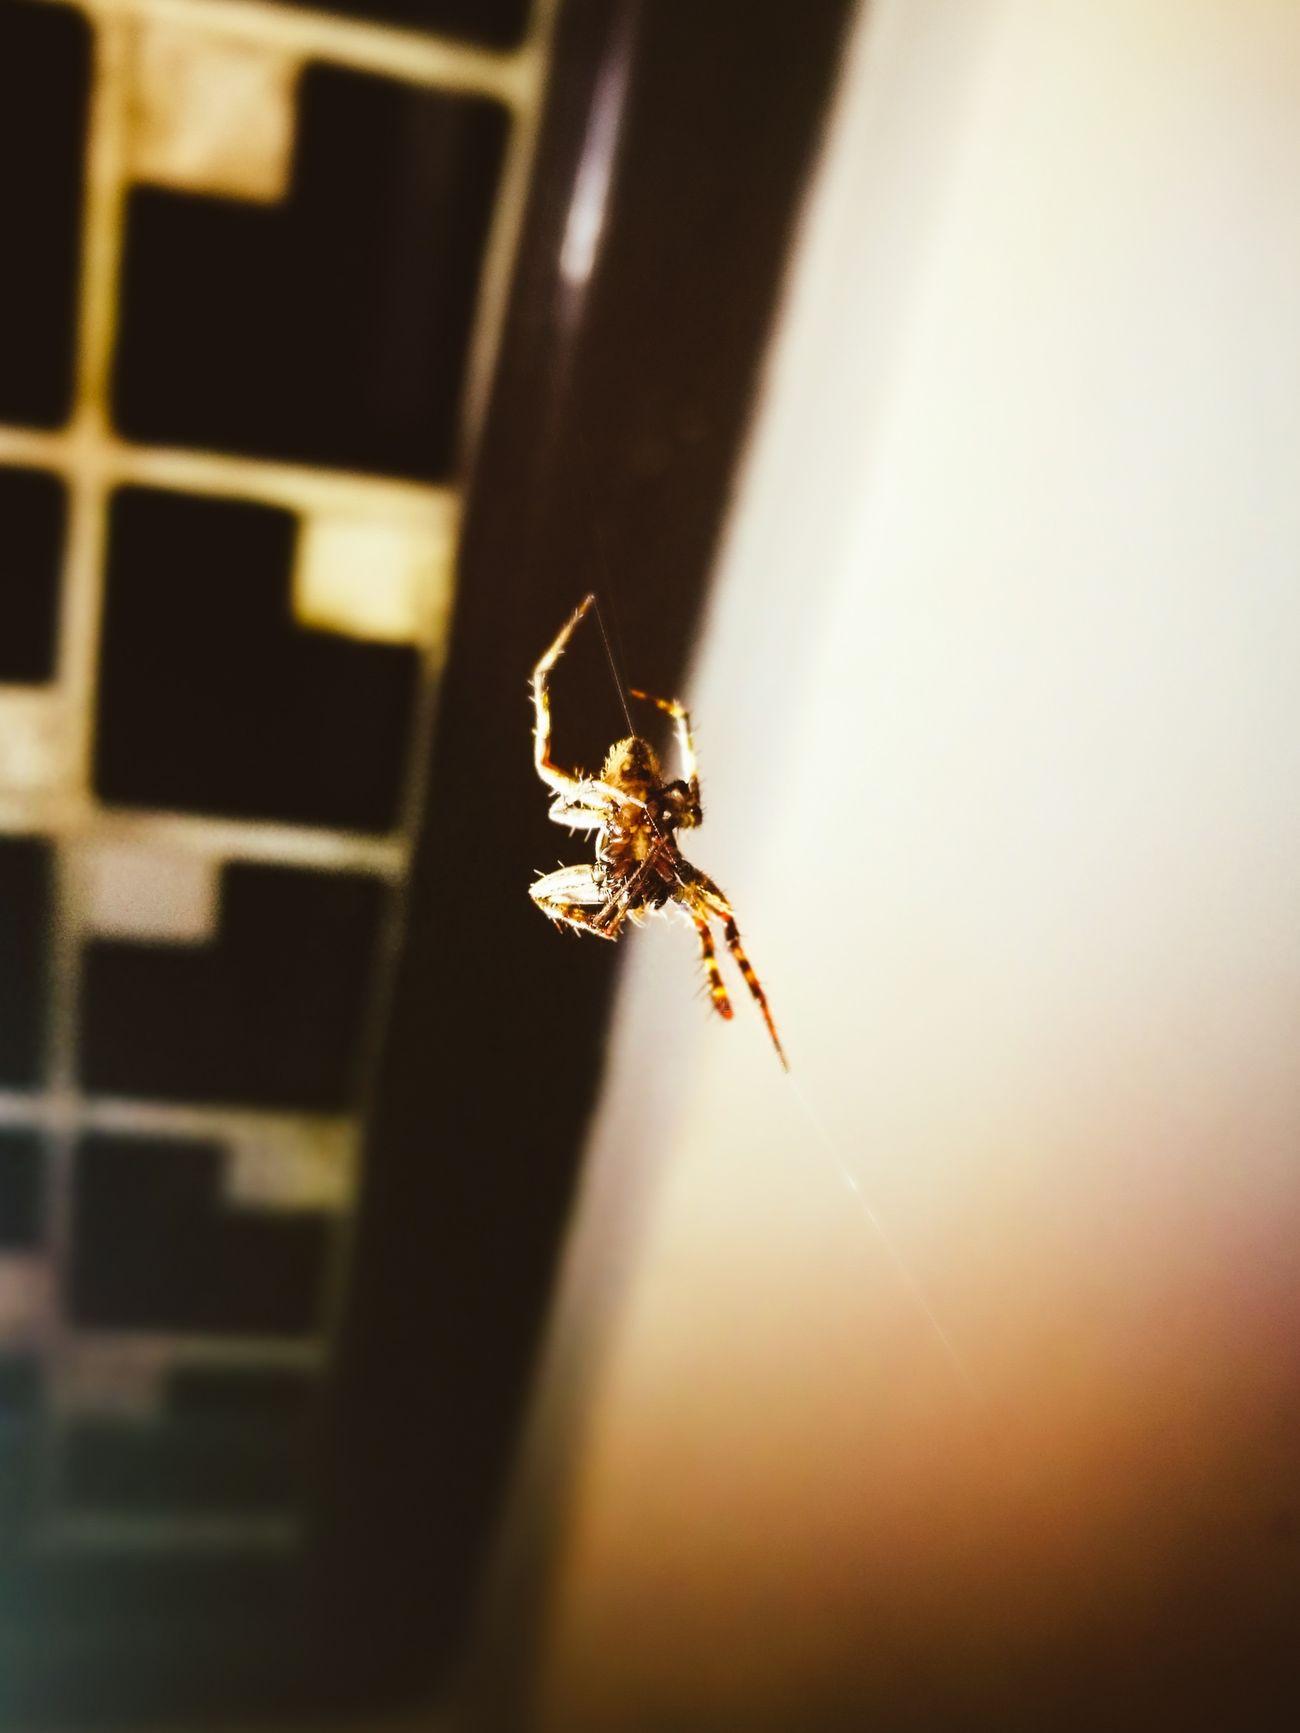 First Eyeem Photo Spiderworld Spider Domestic Room Domestic Animals spider ninja Spidee Web